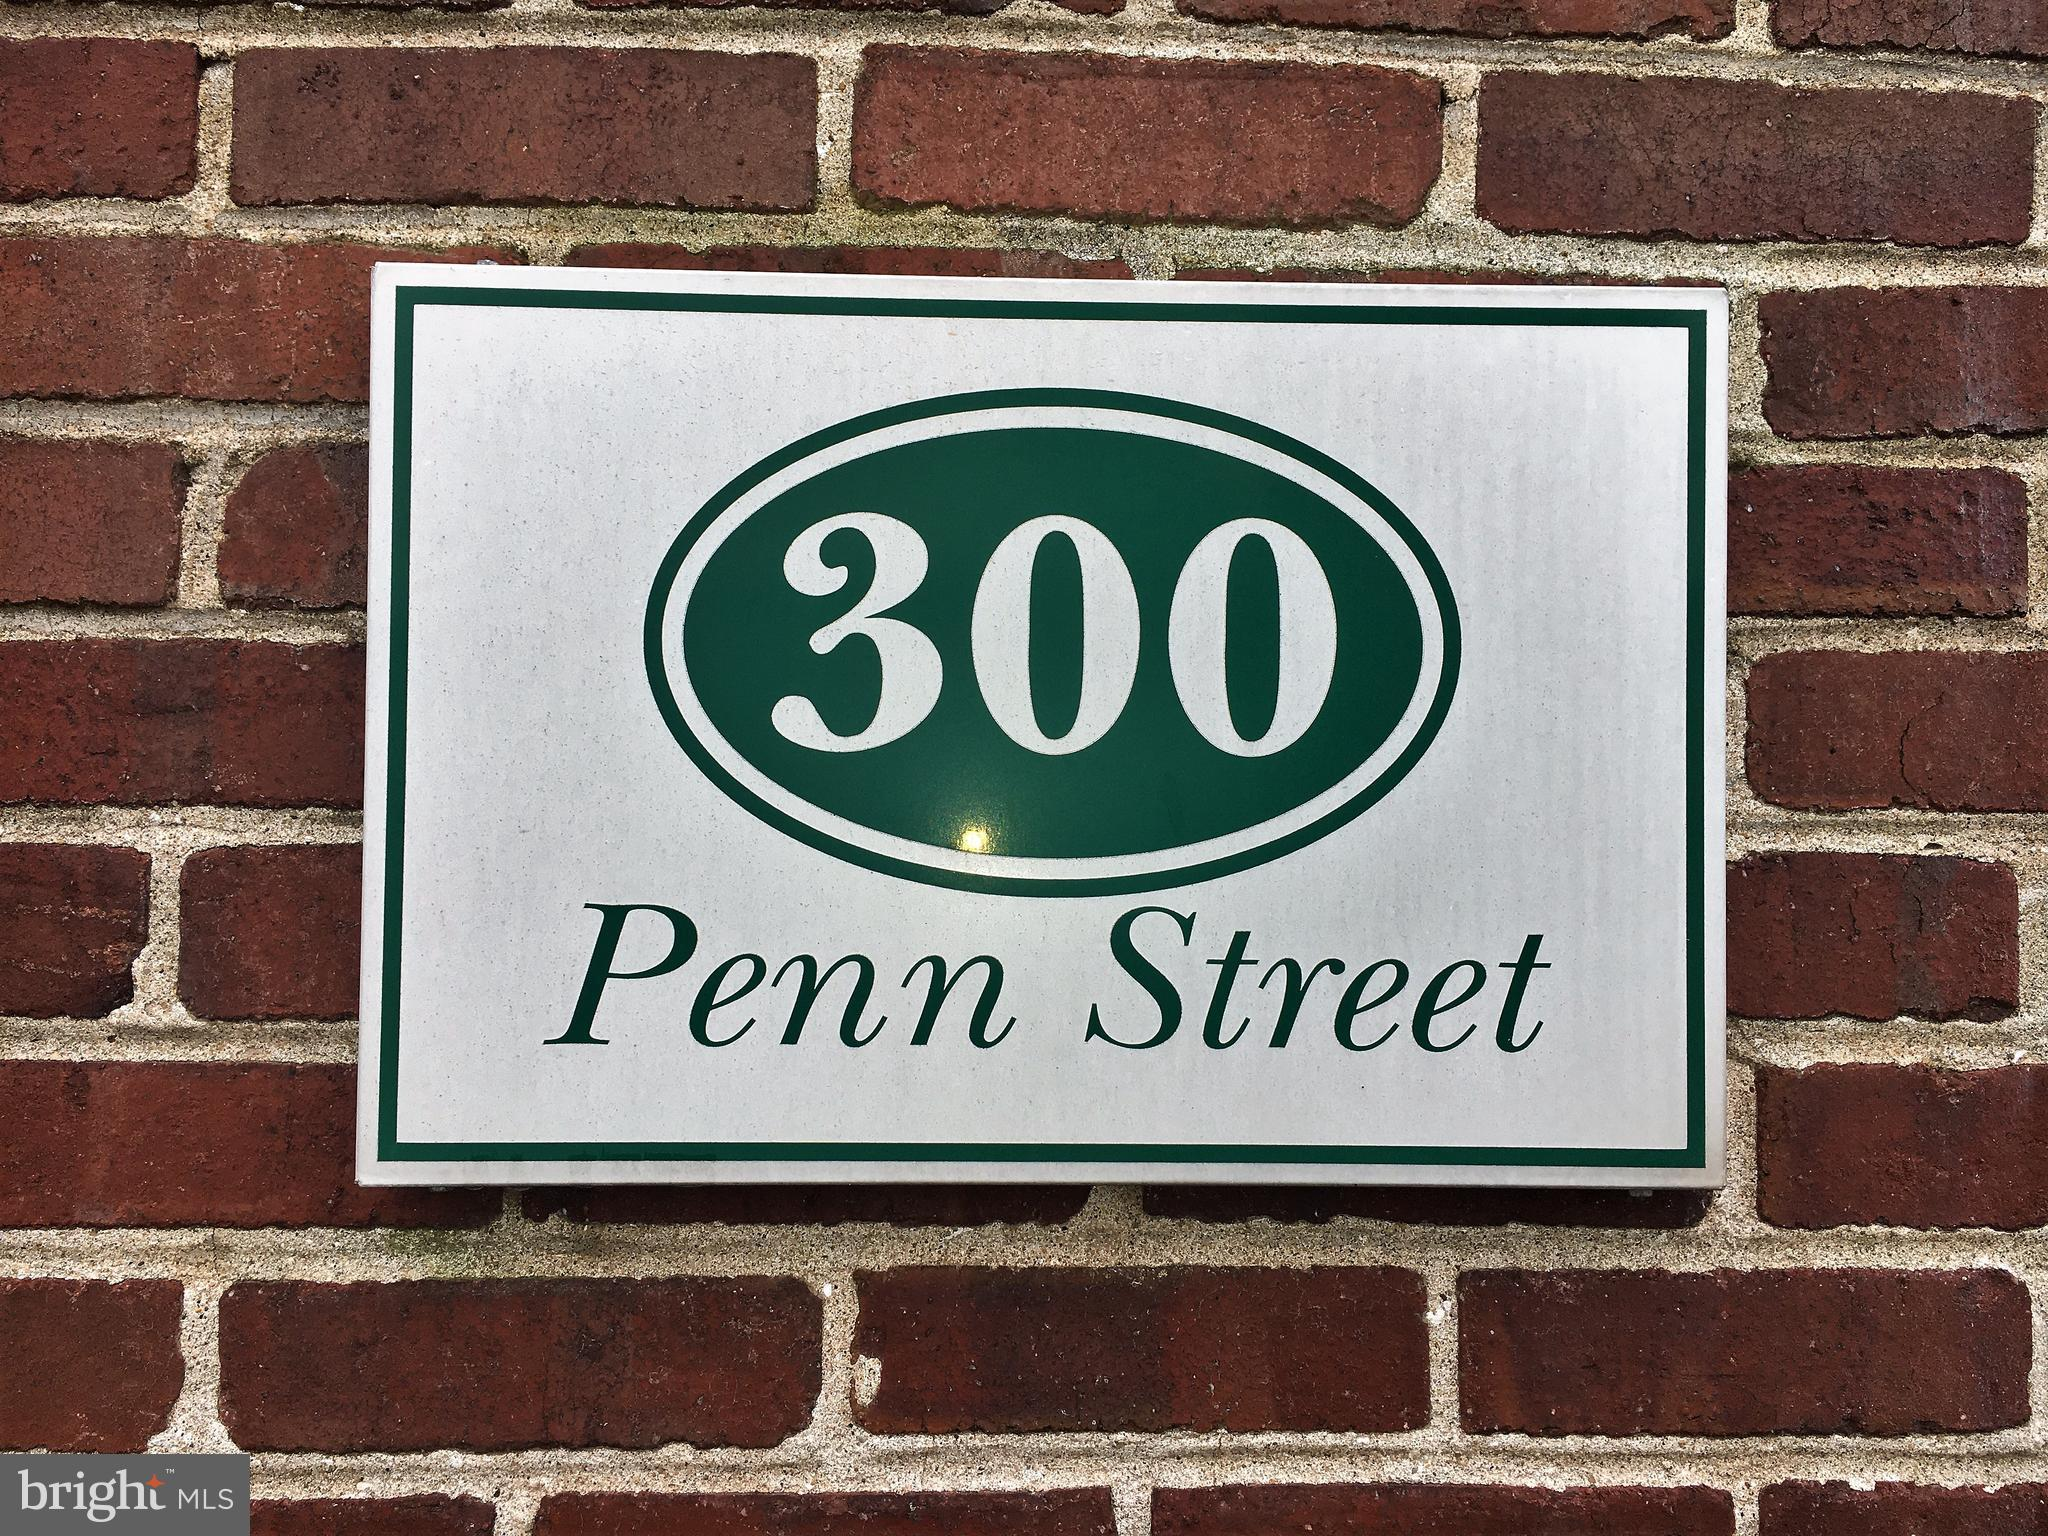 300 E 3RD STREET, PENNSBURG, PA 18073